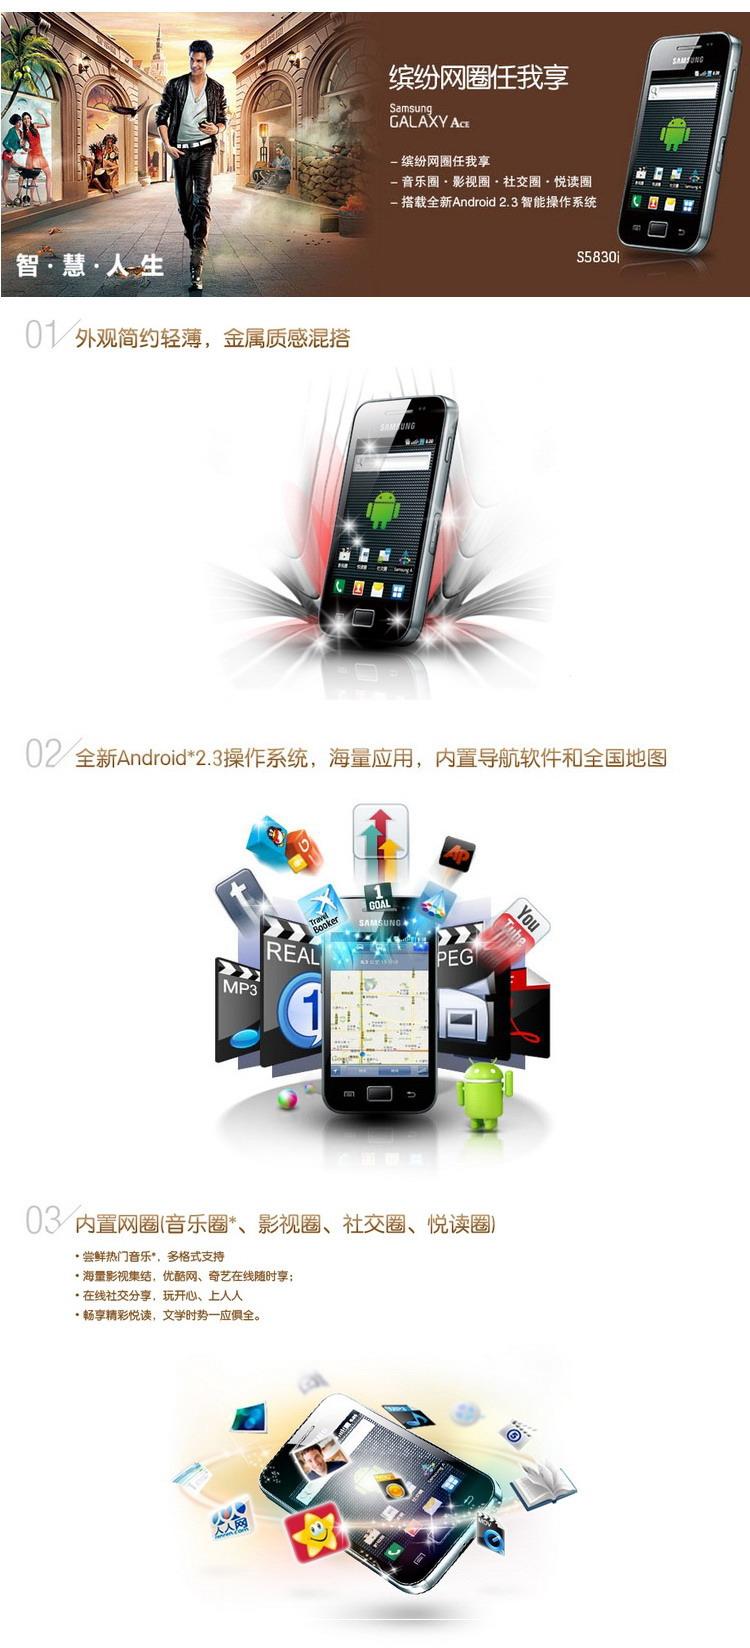 samaung三星 s5830i 3g手机 纯白 wcdm 高清图片